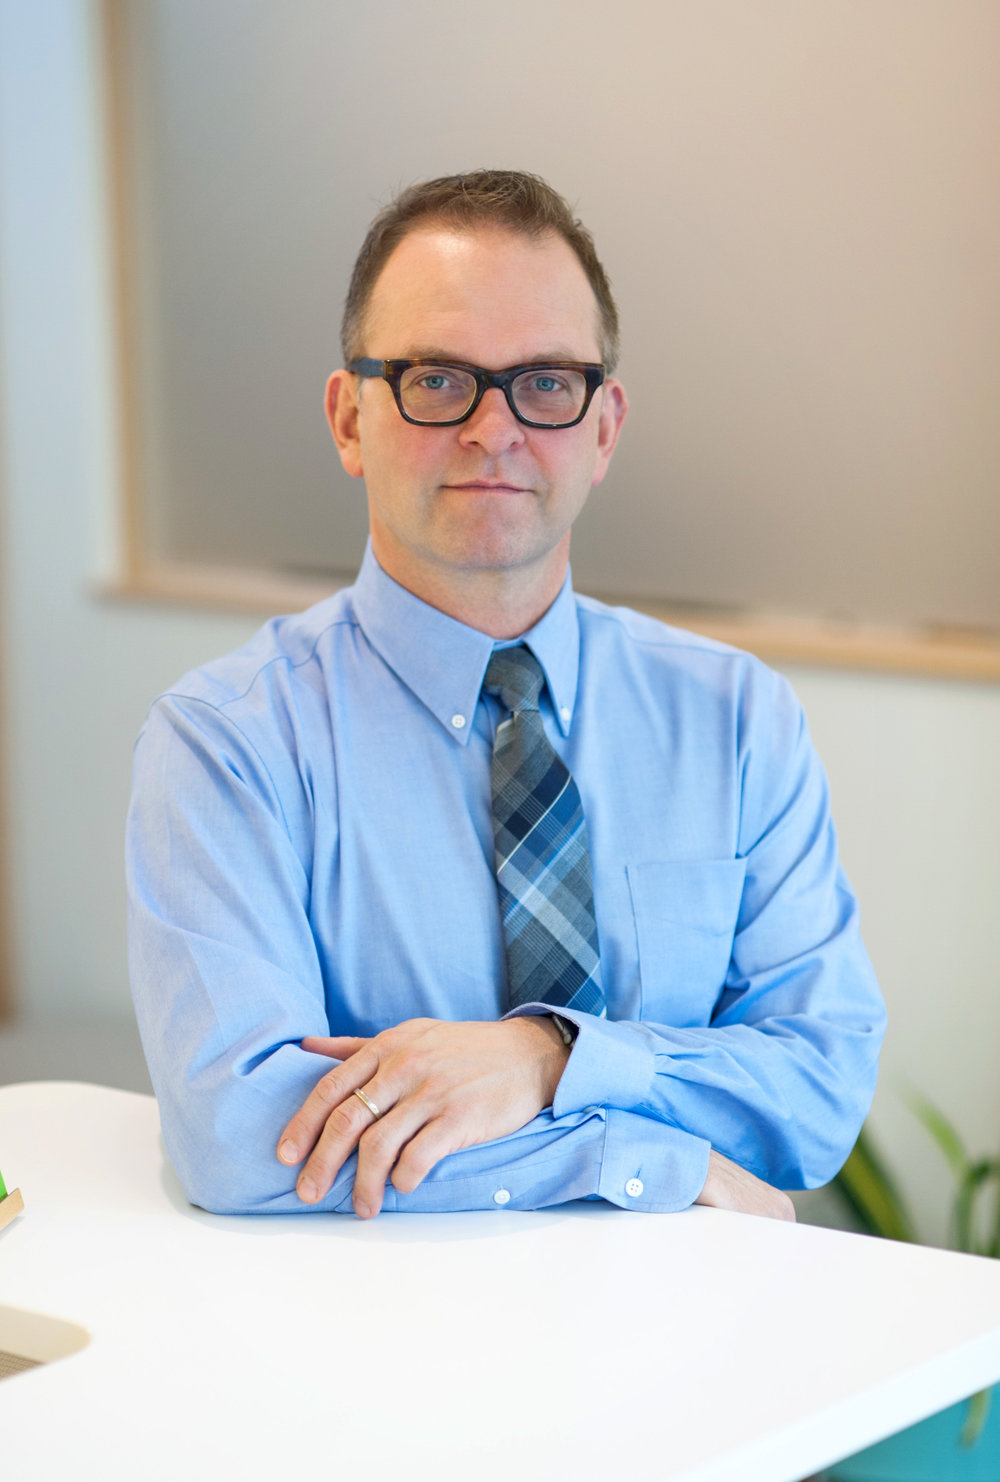 Dr. Chris Bierbrauer, Licensed Chiropractor View myCurriculum Vitae